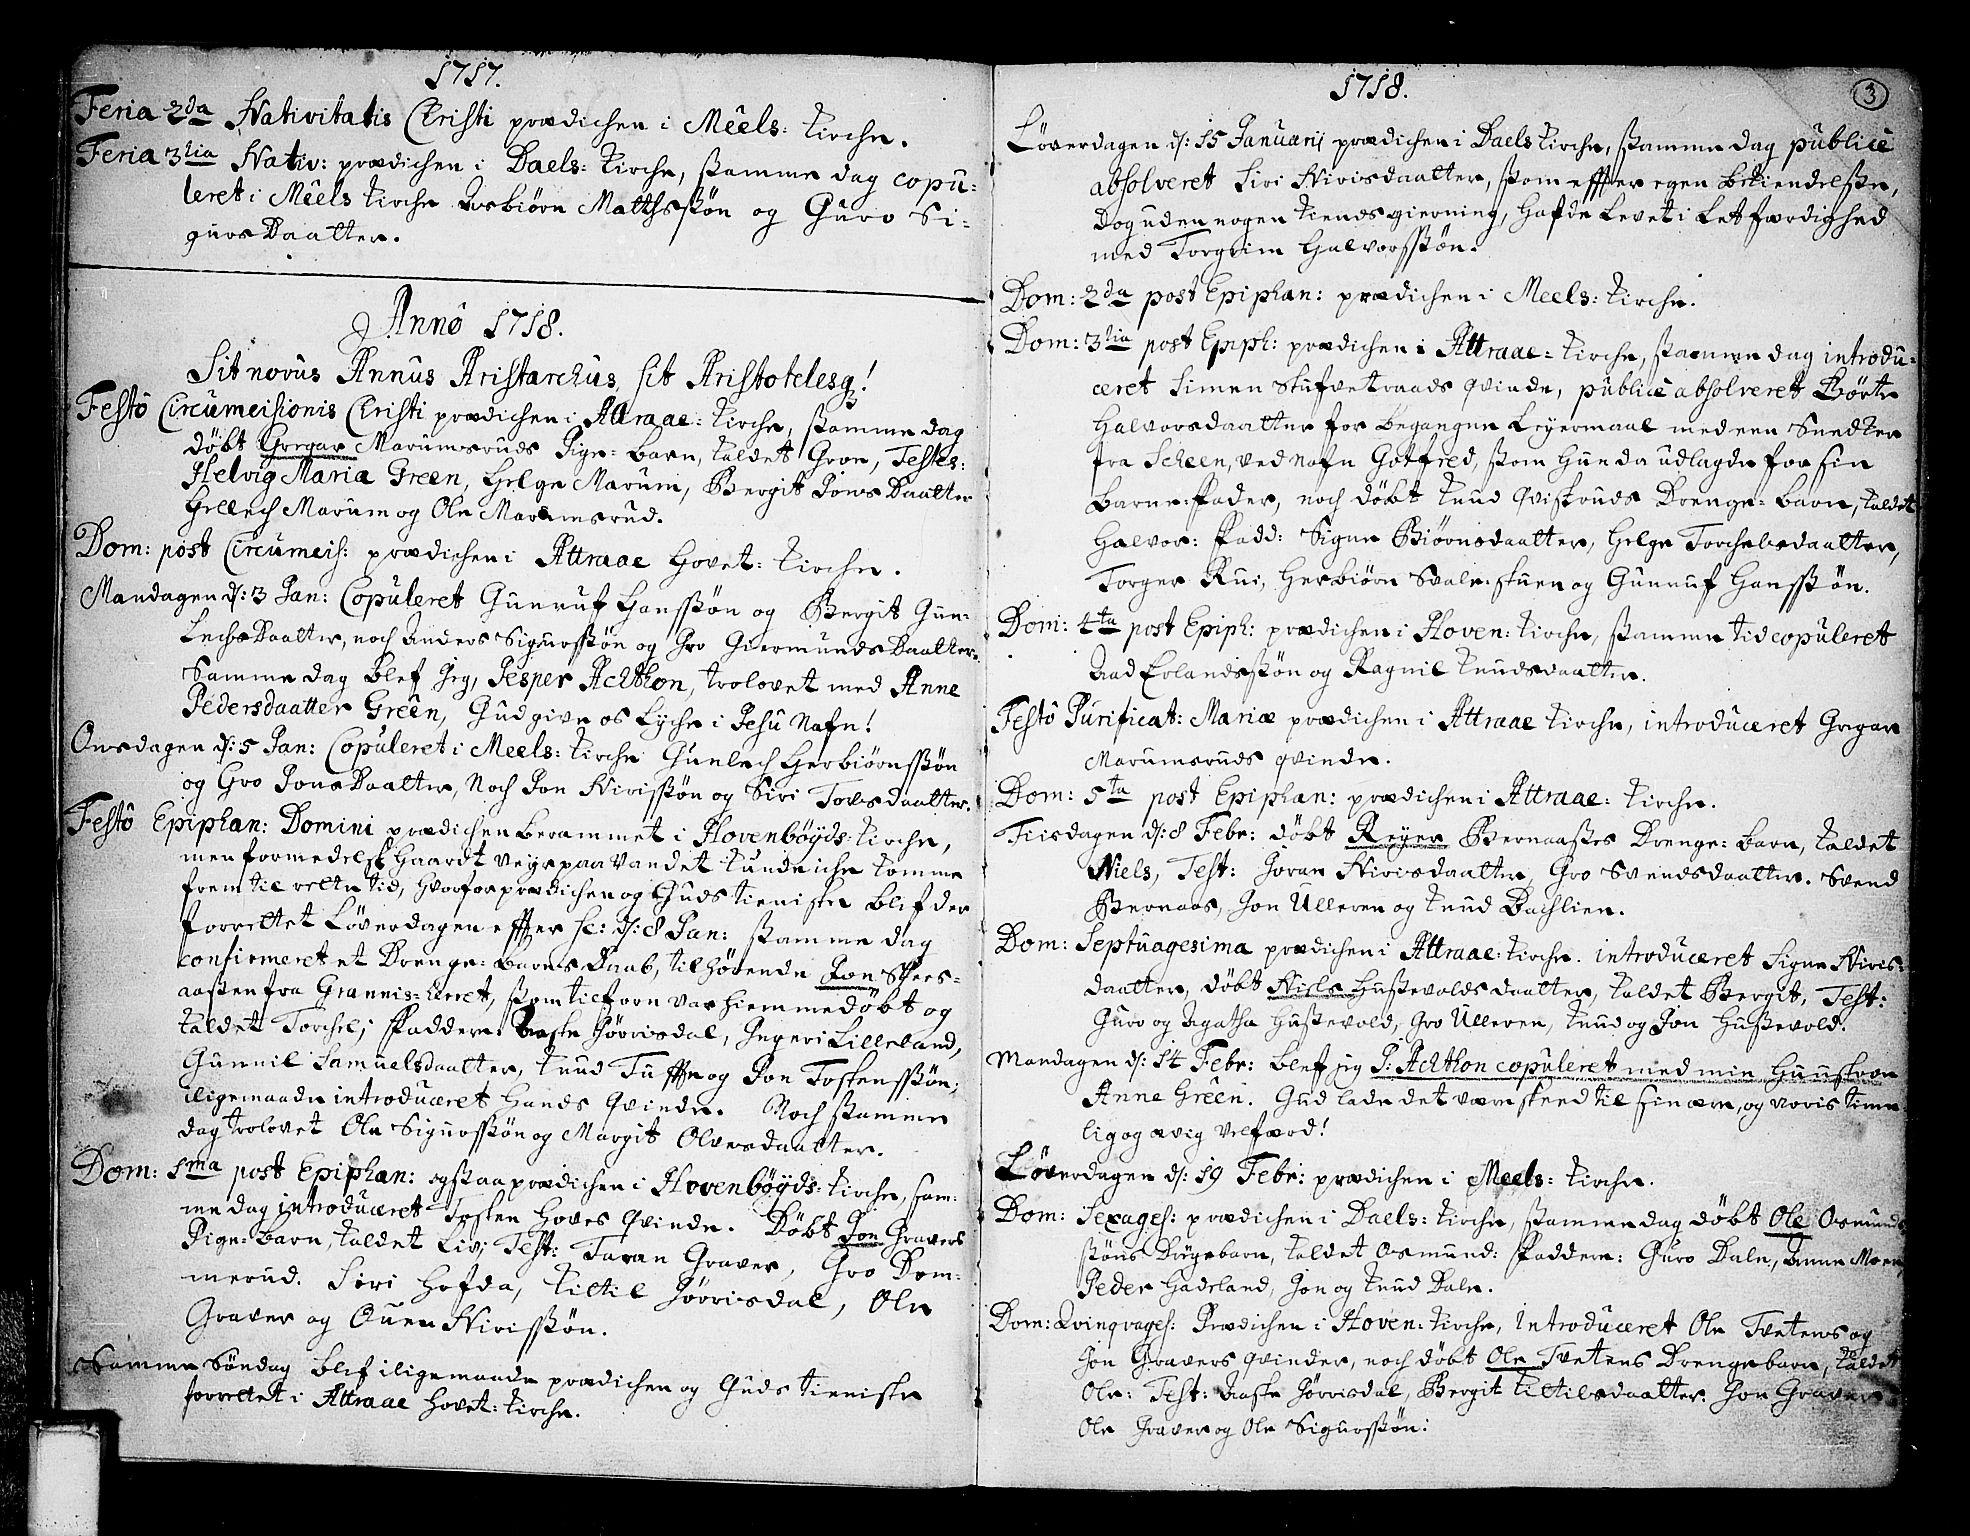 SAKO, Tinn kirkebøker, F/Fa/L0001: Ministerialbok nr. I 1, 1717-1734, s. 3